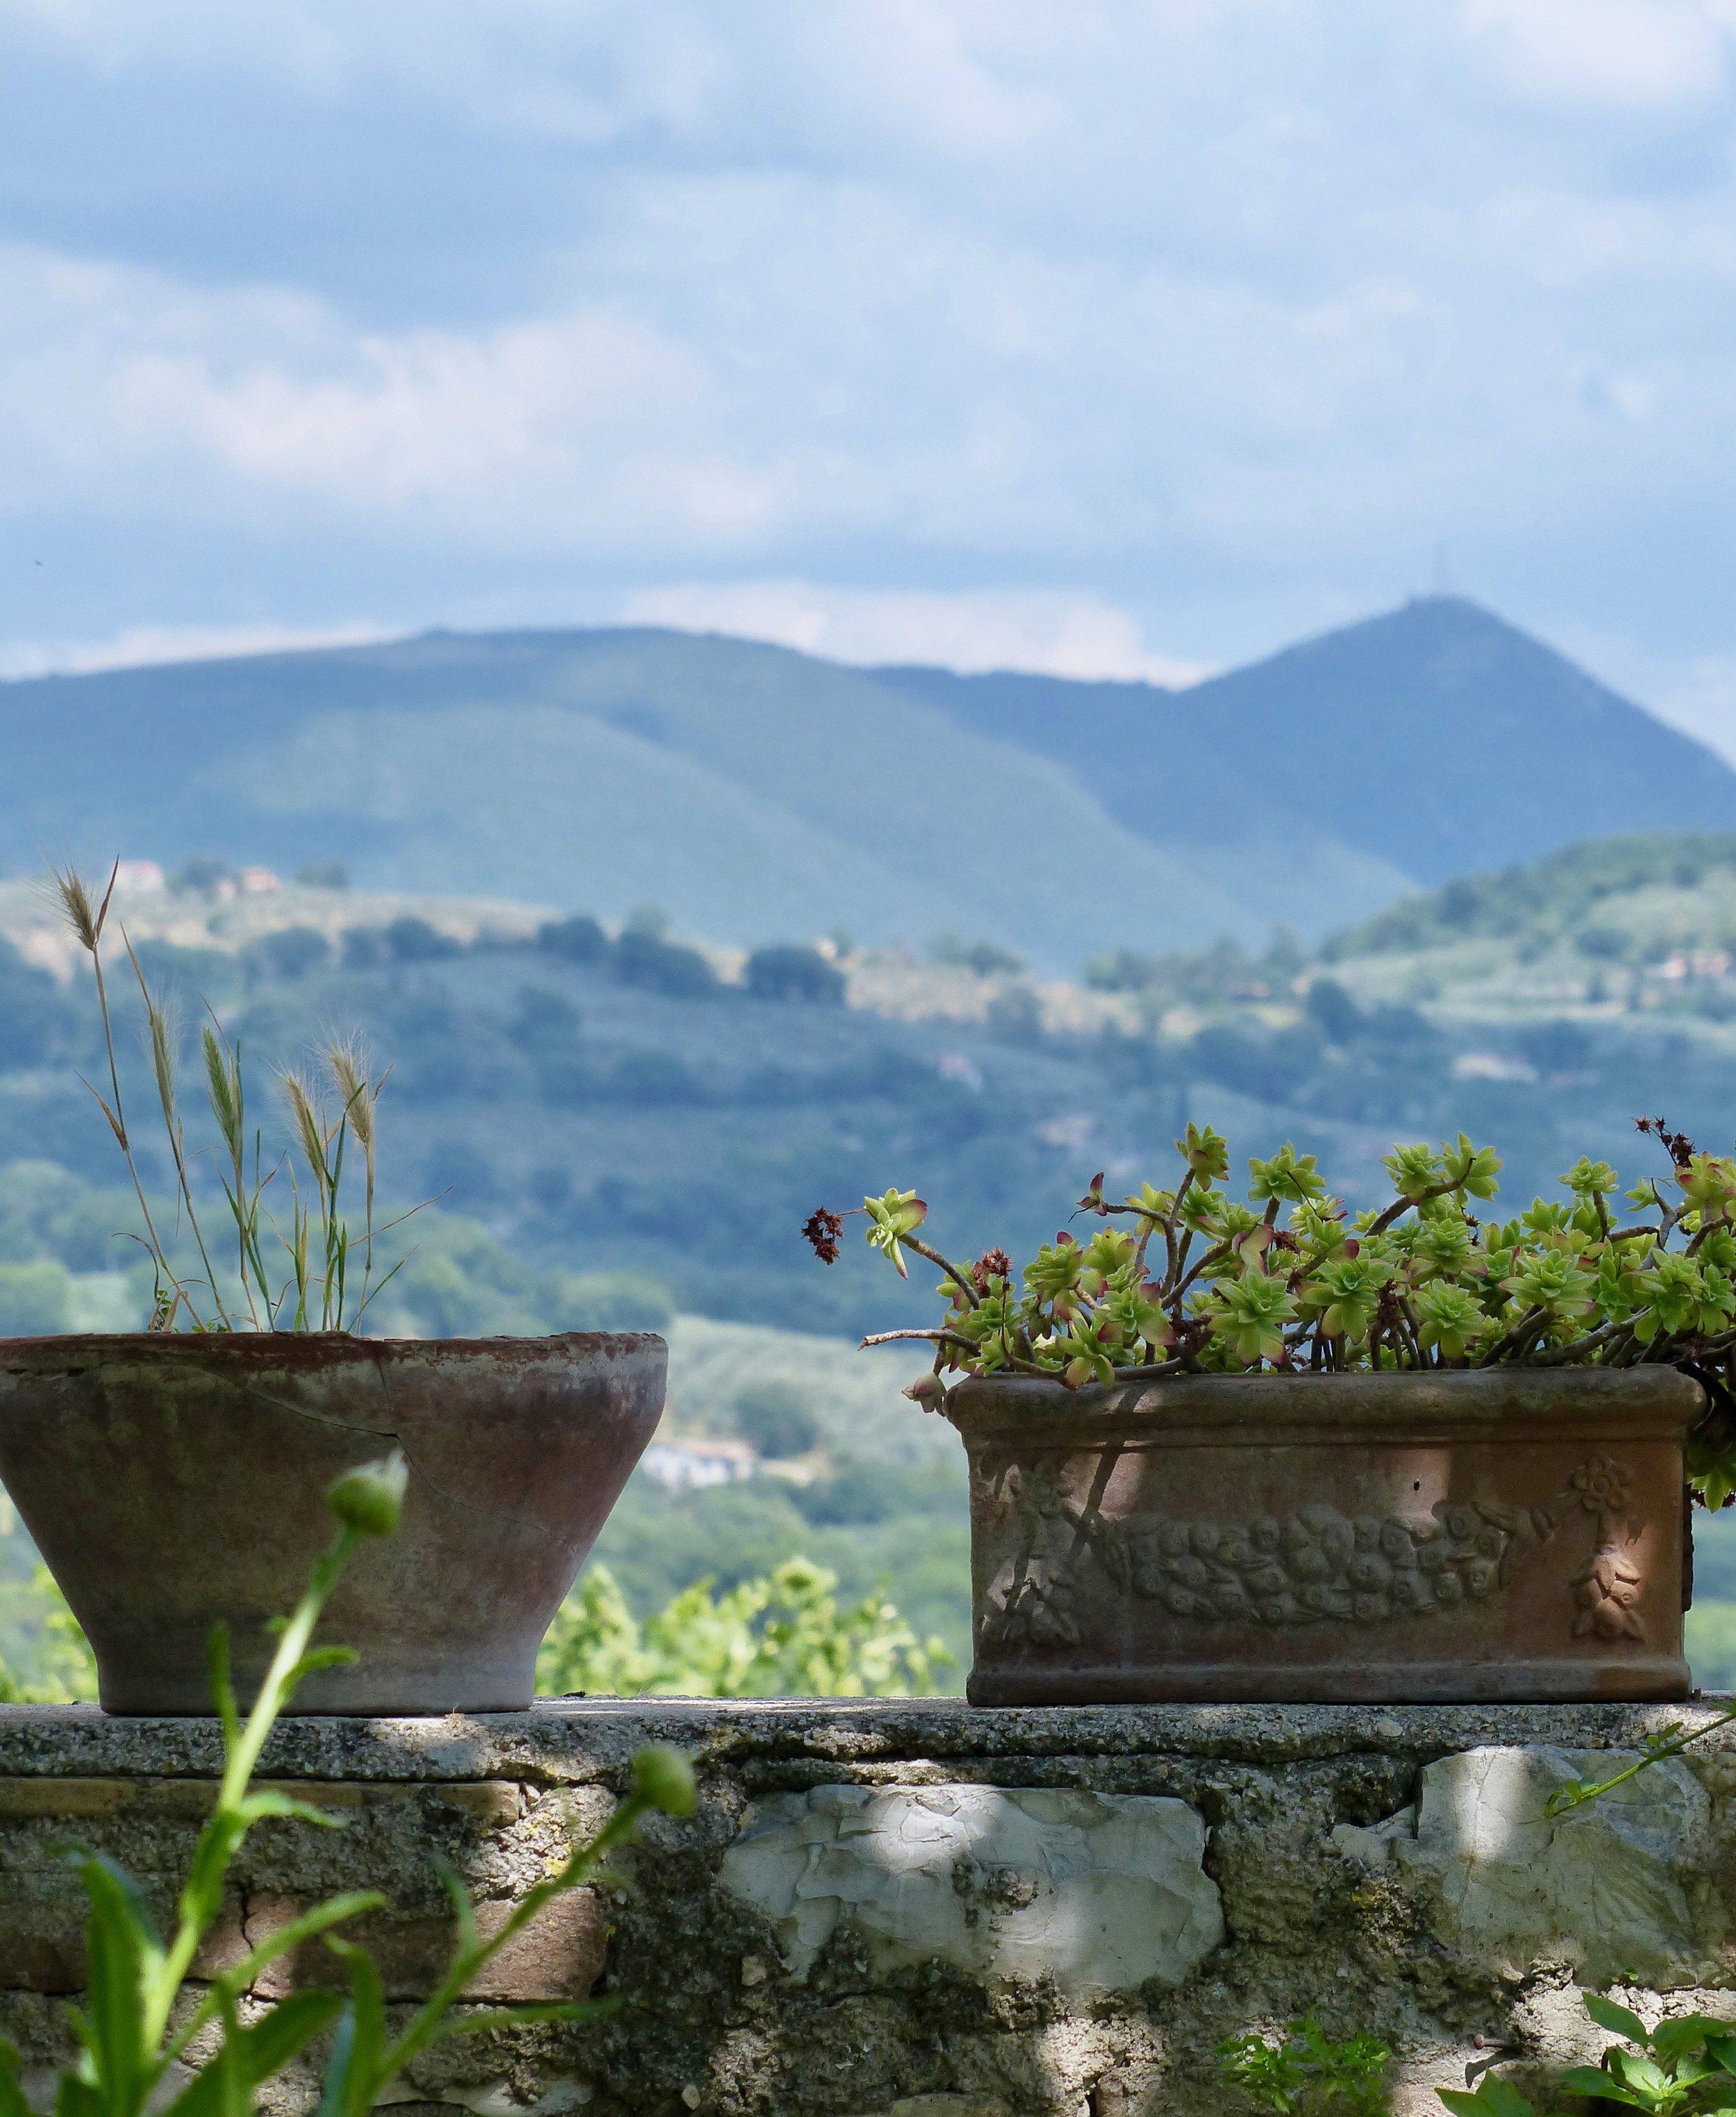 Our garden in Spello